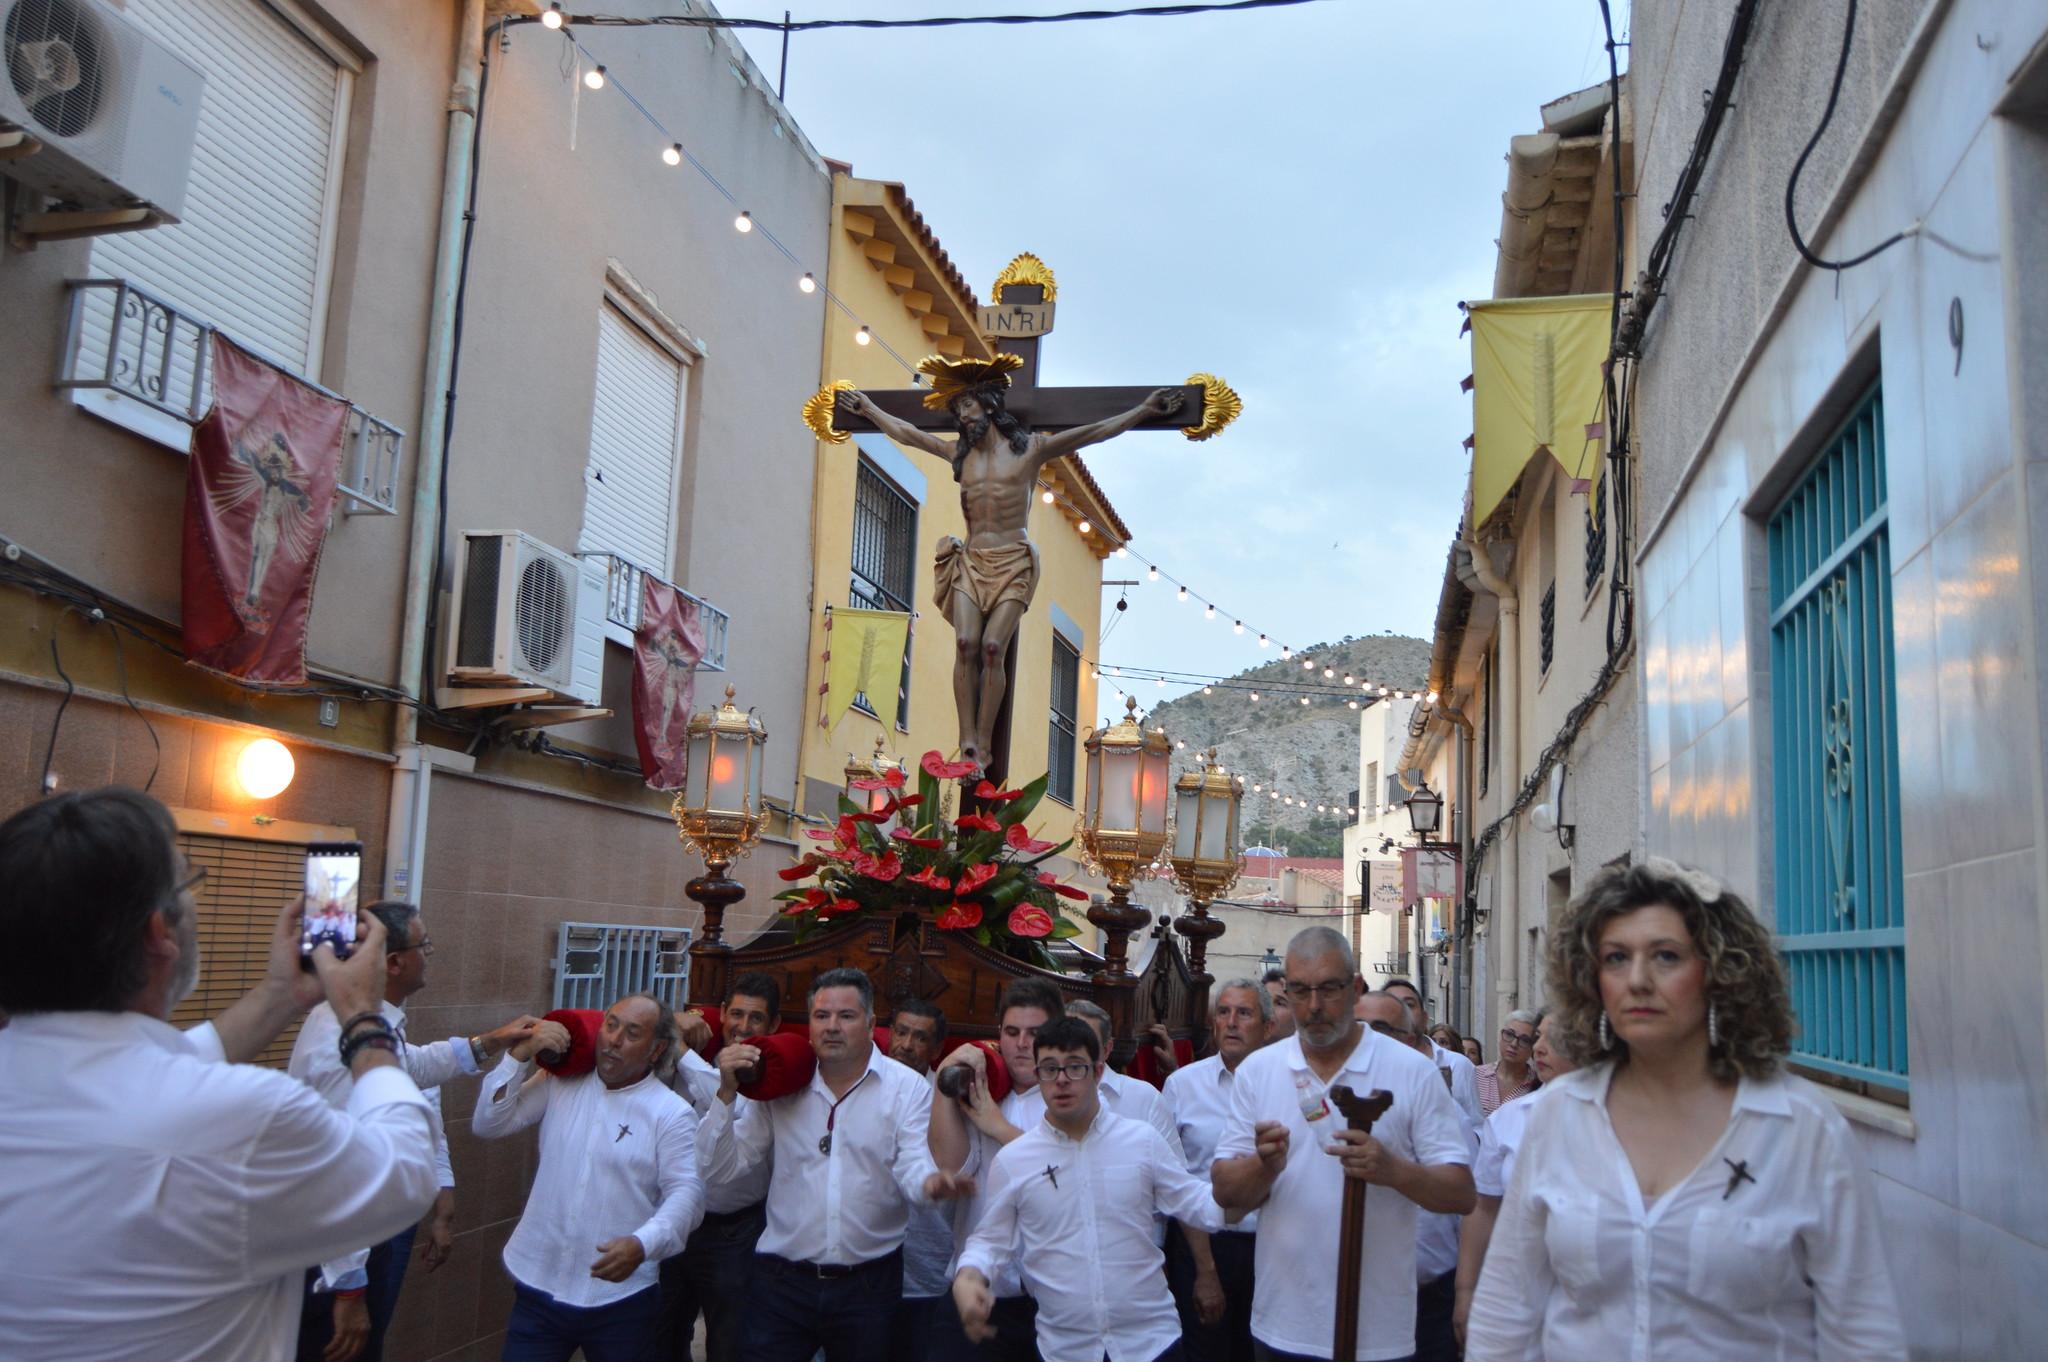 (2019-07-07) Procesión de subida - Adrián Romero Montesinos (20)